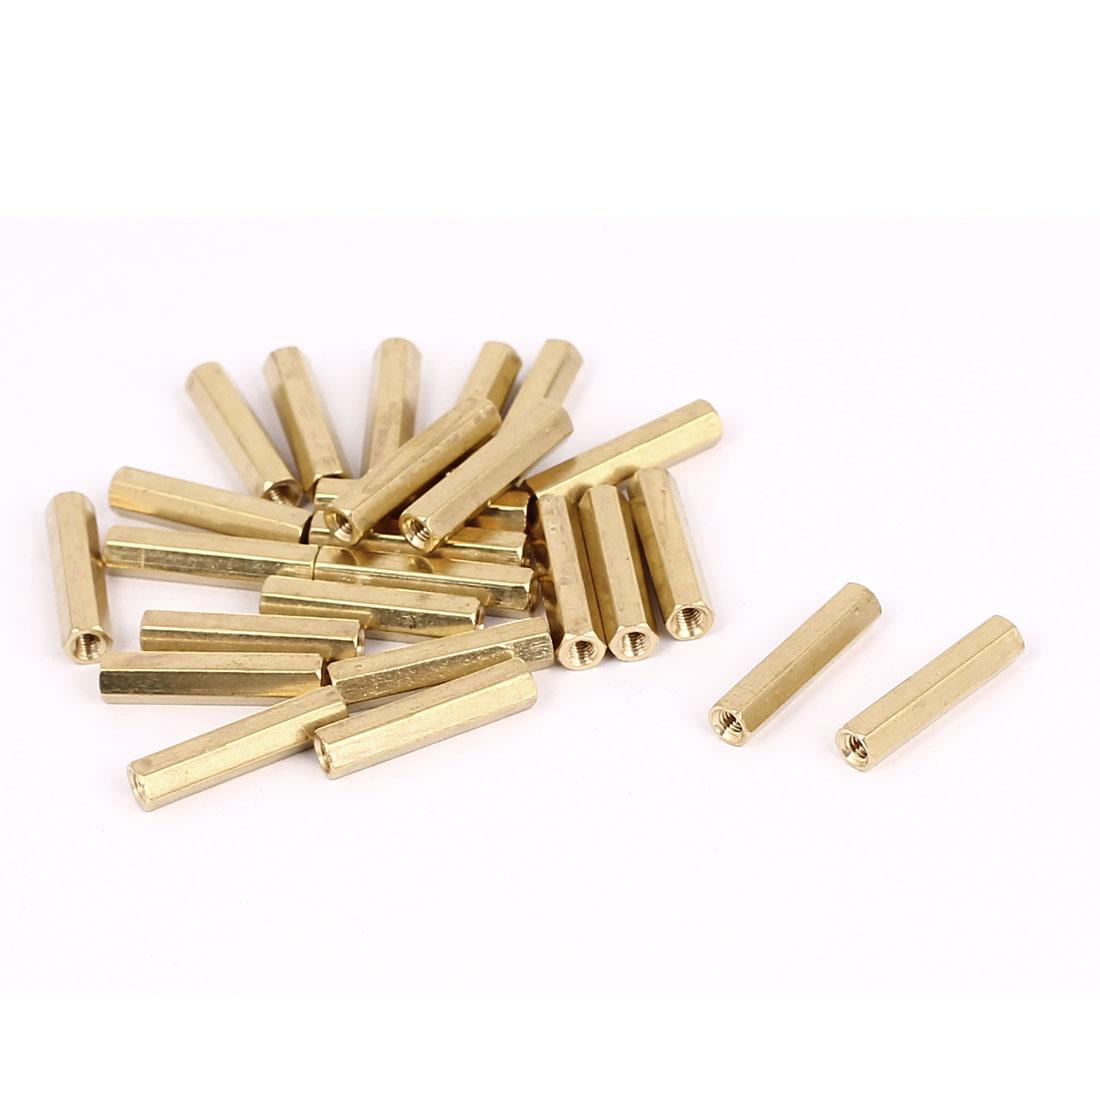 M3 x 22mm Female Thread Brass Hex Standoff Pillar Rod Spacer Coupler Nut 25pcs